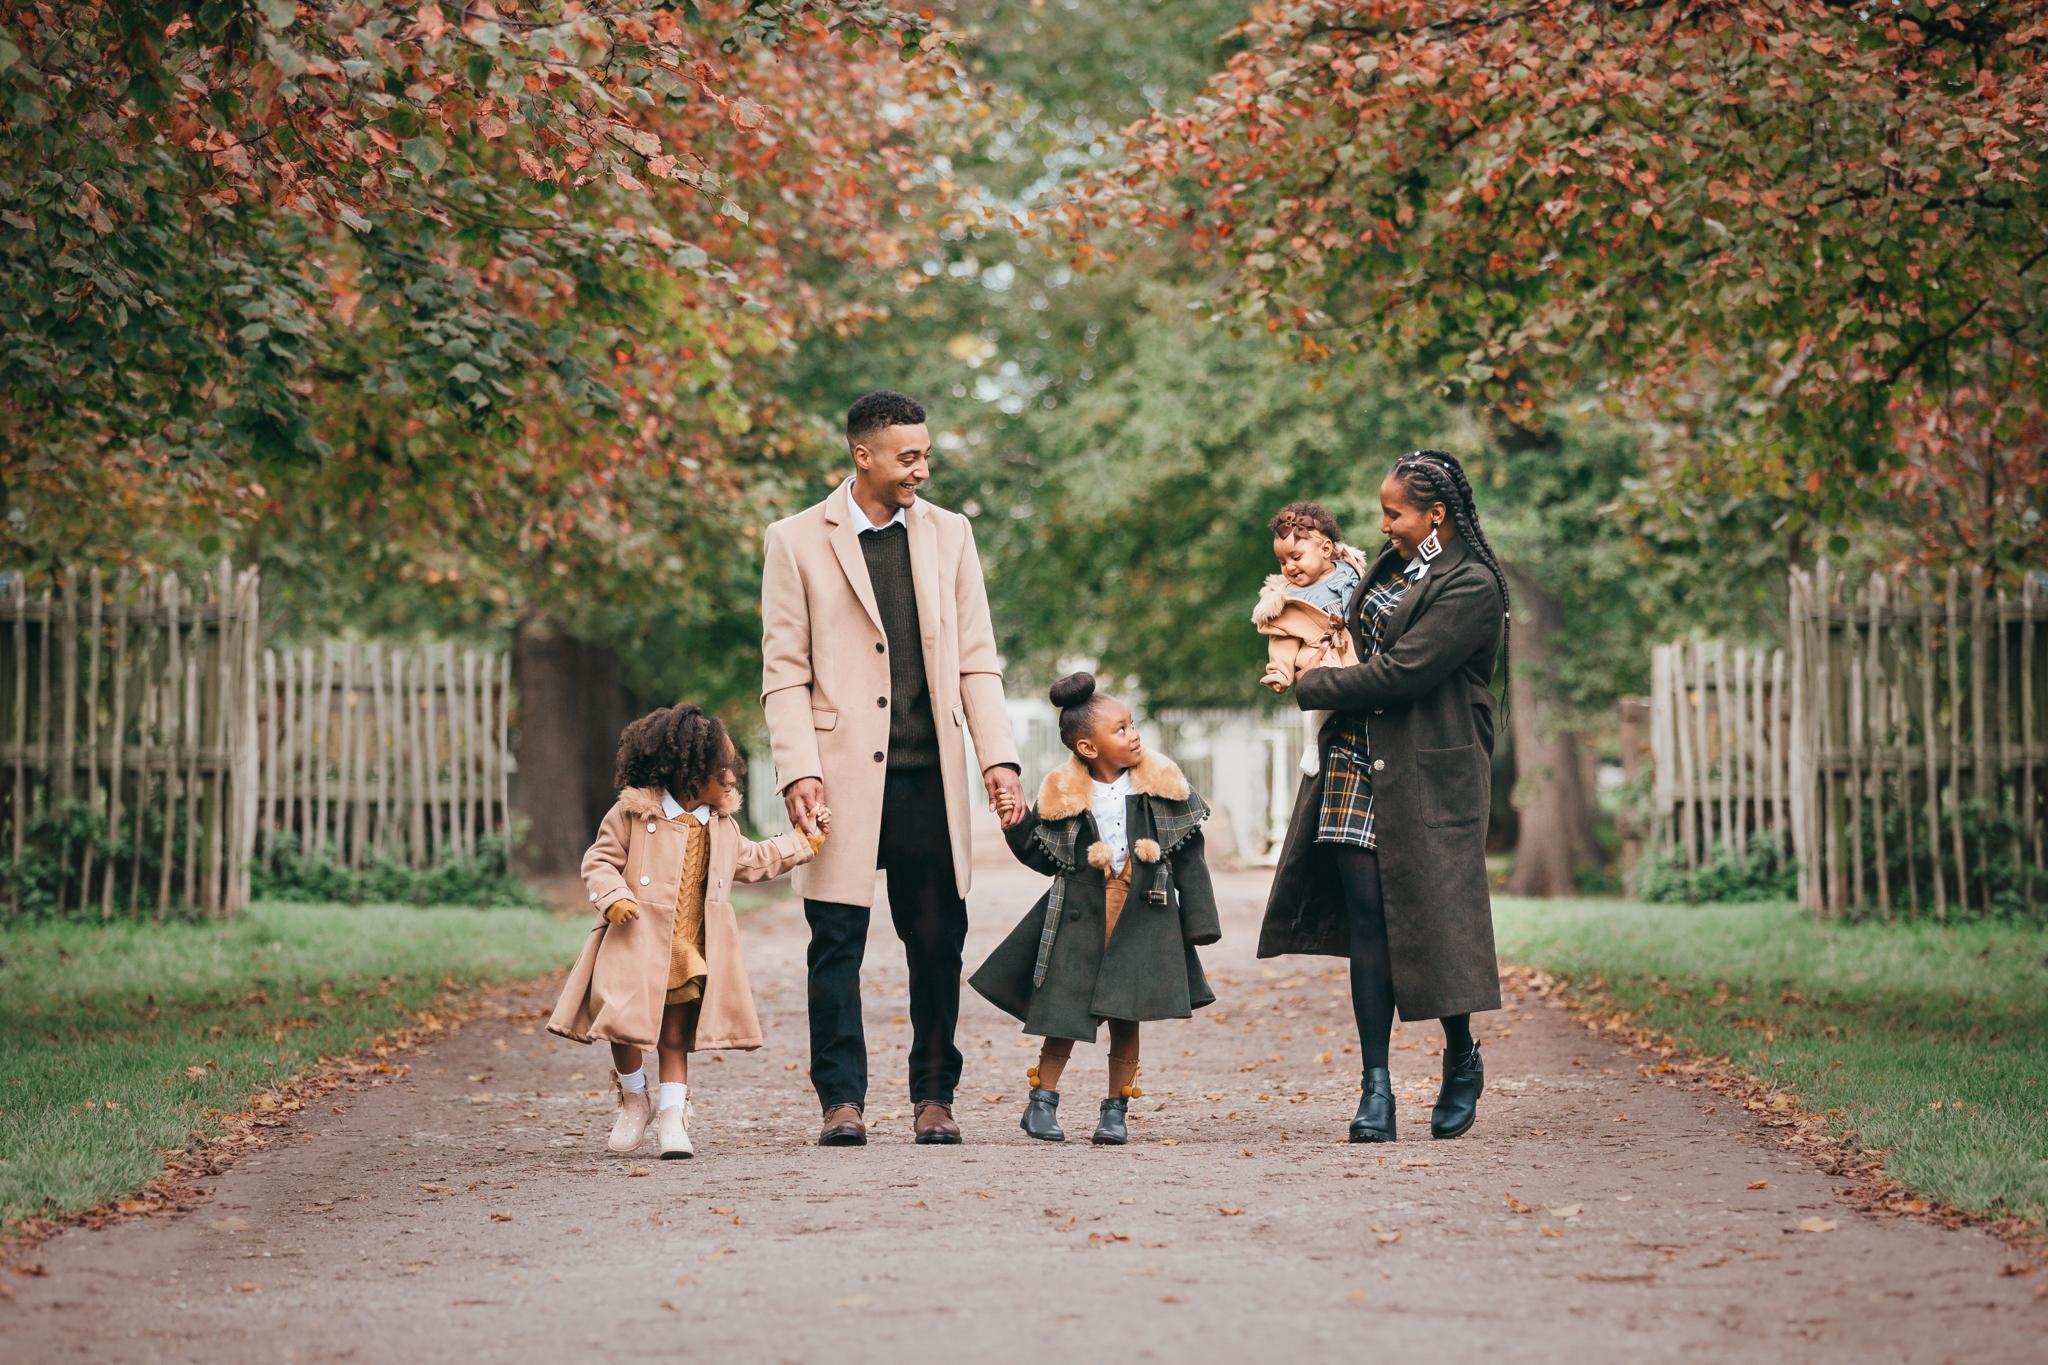 family walking autumn.jpg